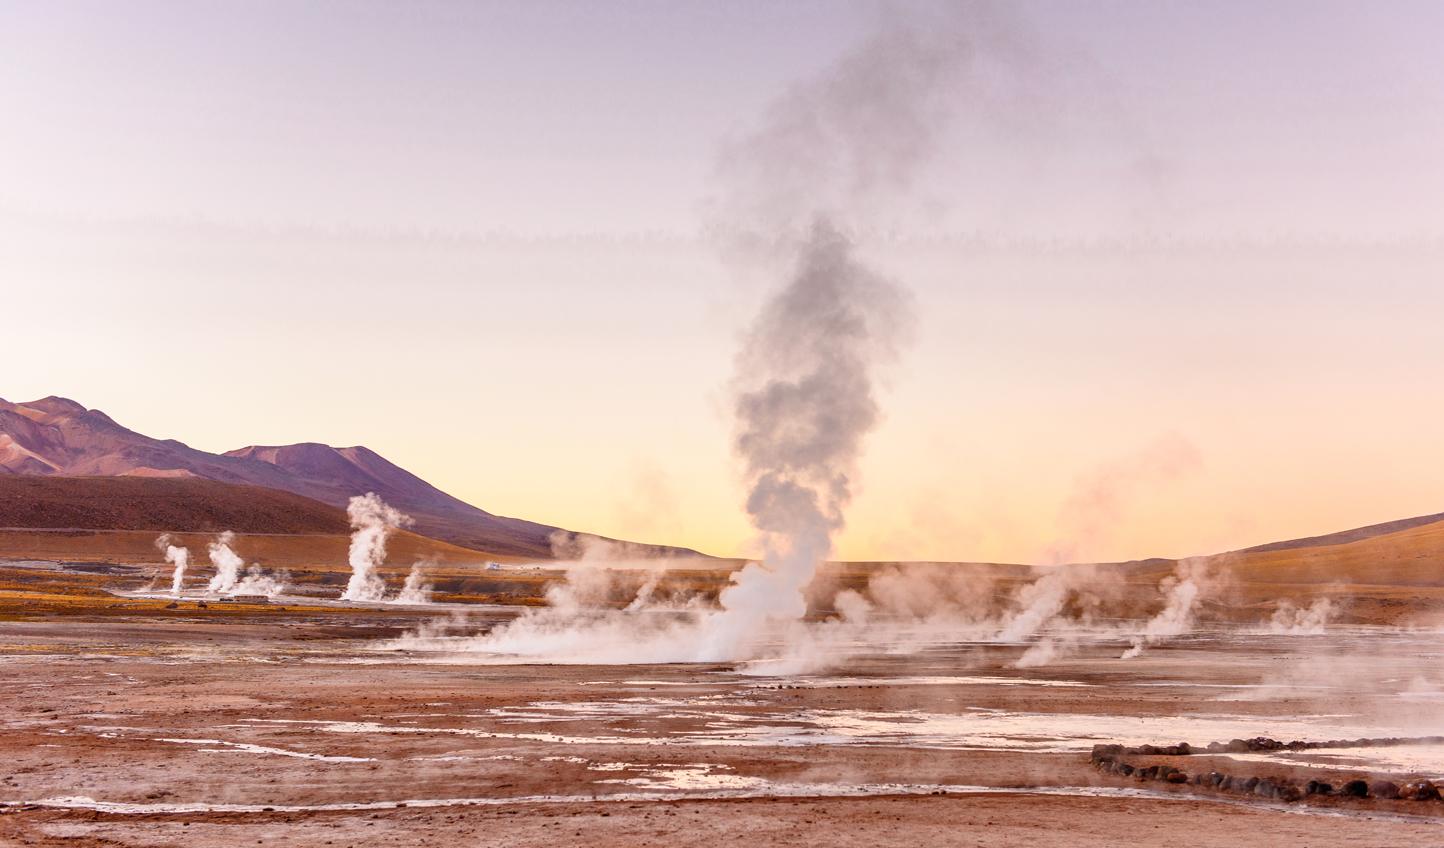 Volcanic landscapes that invite adventure